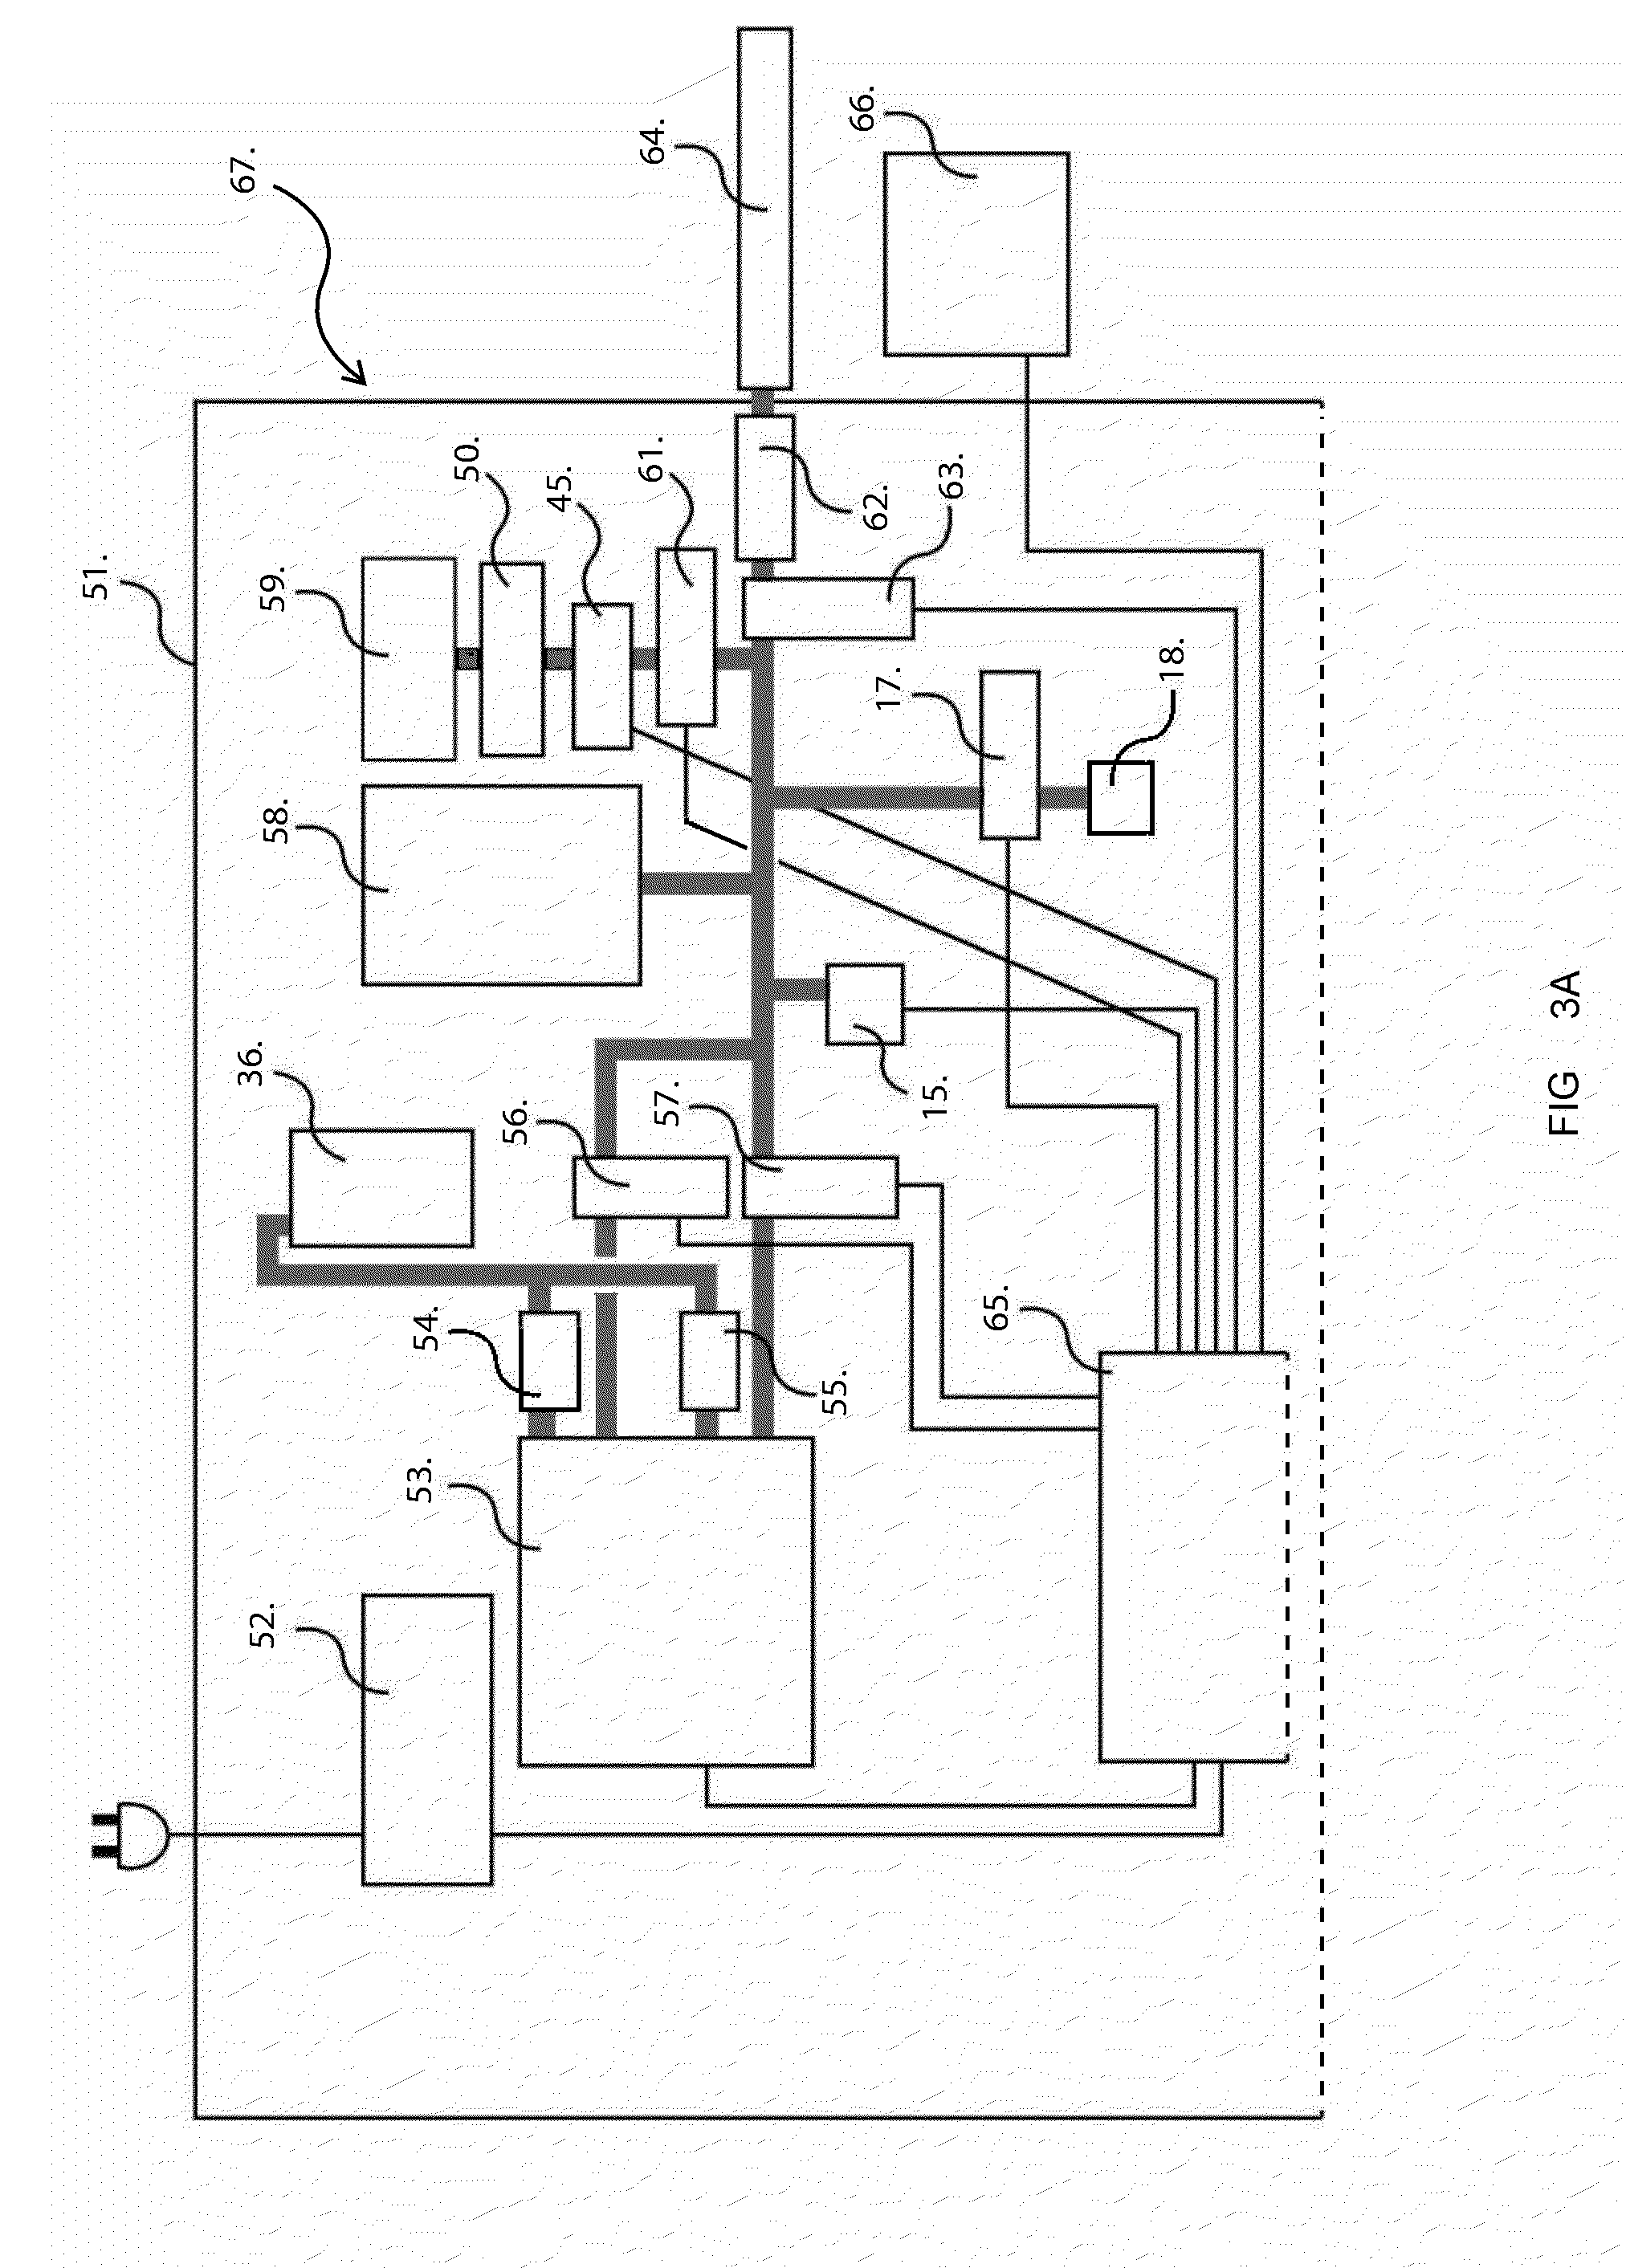 fuse box wiring diagram 1995 hummer h1